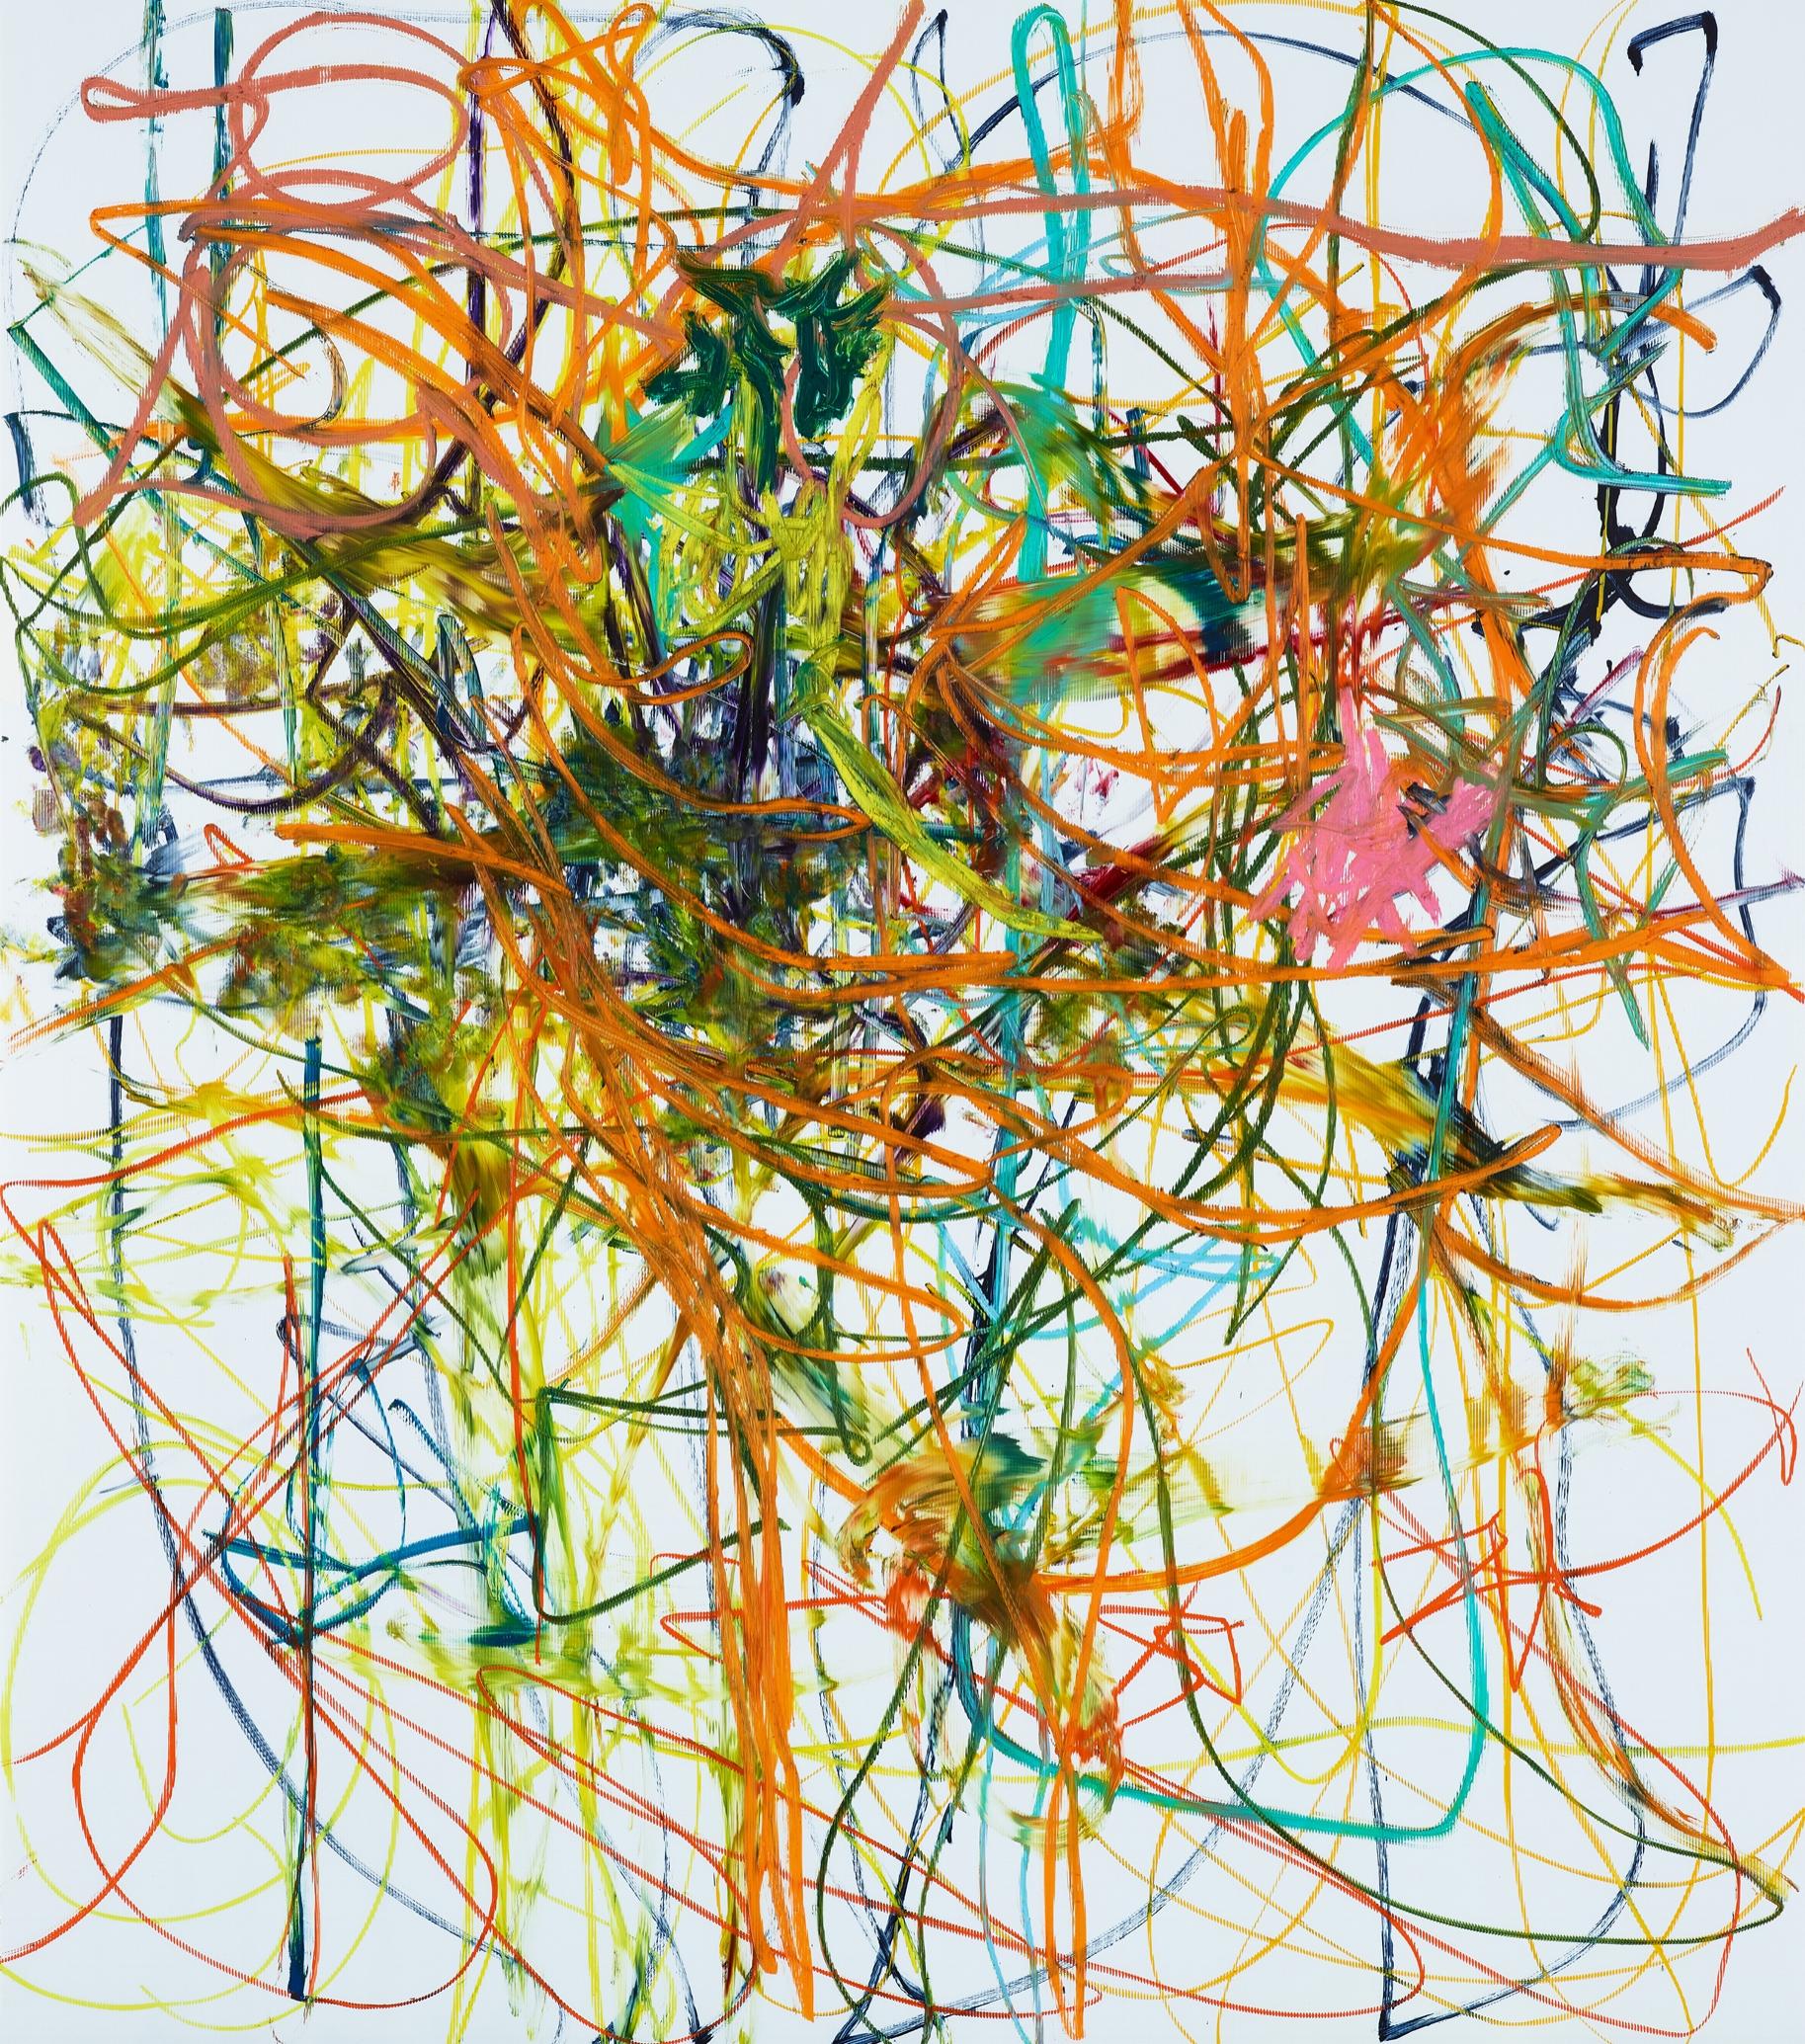 Aaron Garber-Maikovska   Untitled  2017 Ink and oil stick on archival gaterboard, framed 203 x 228,5 cm